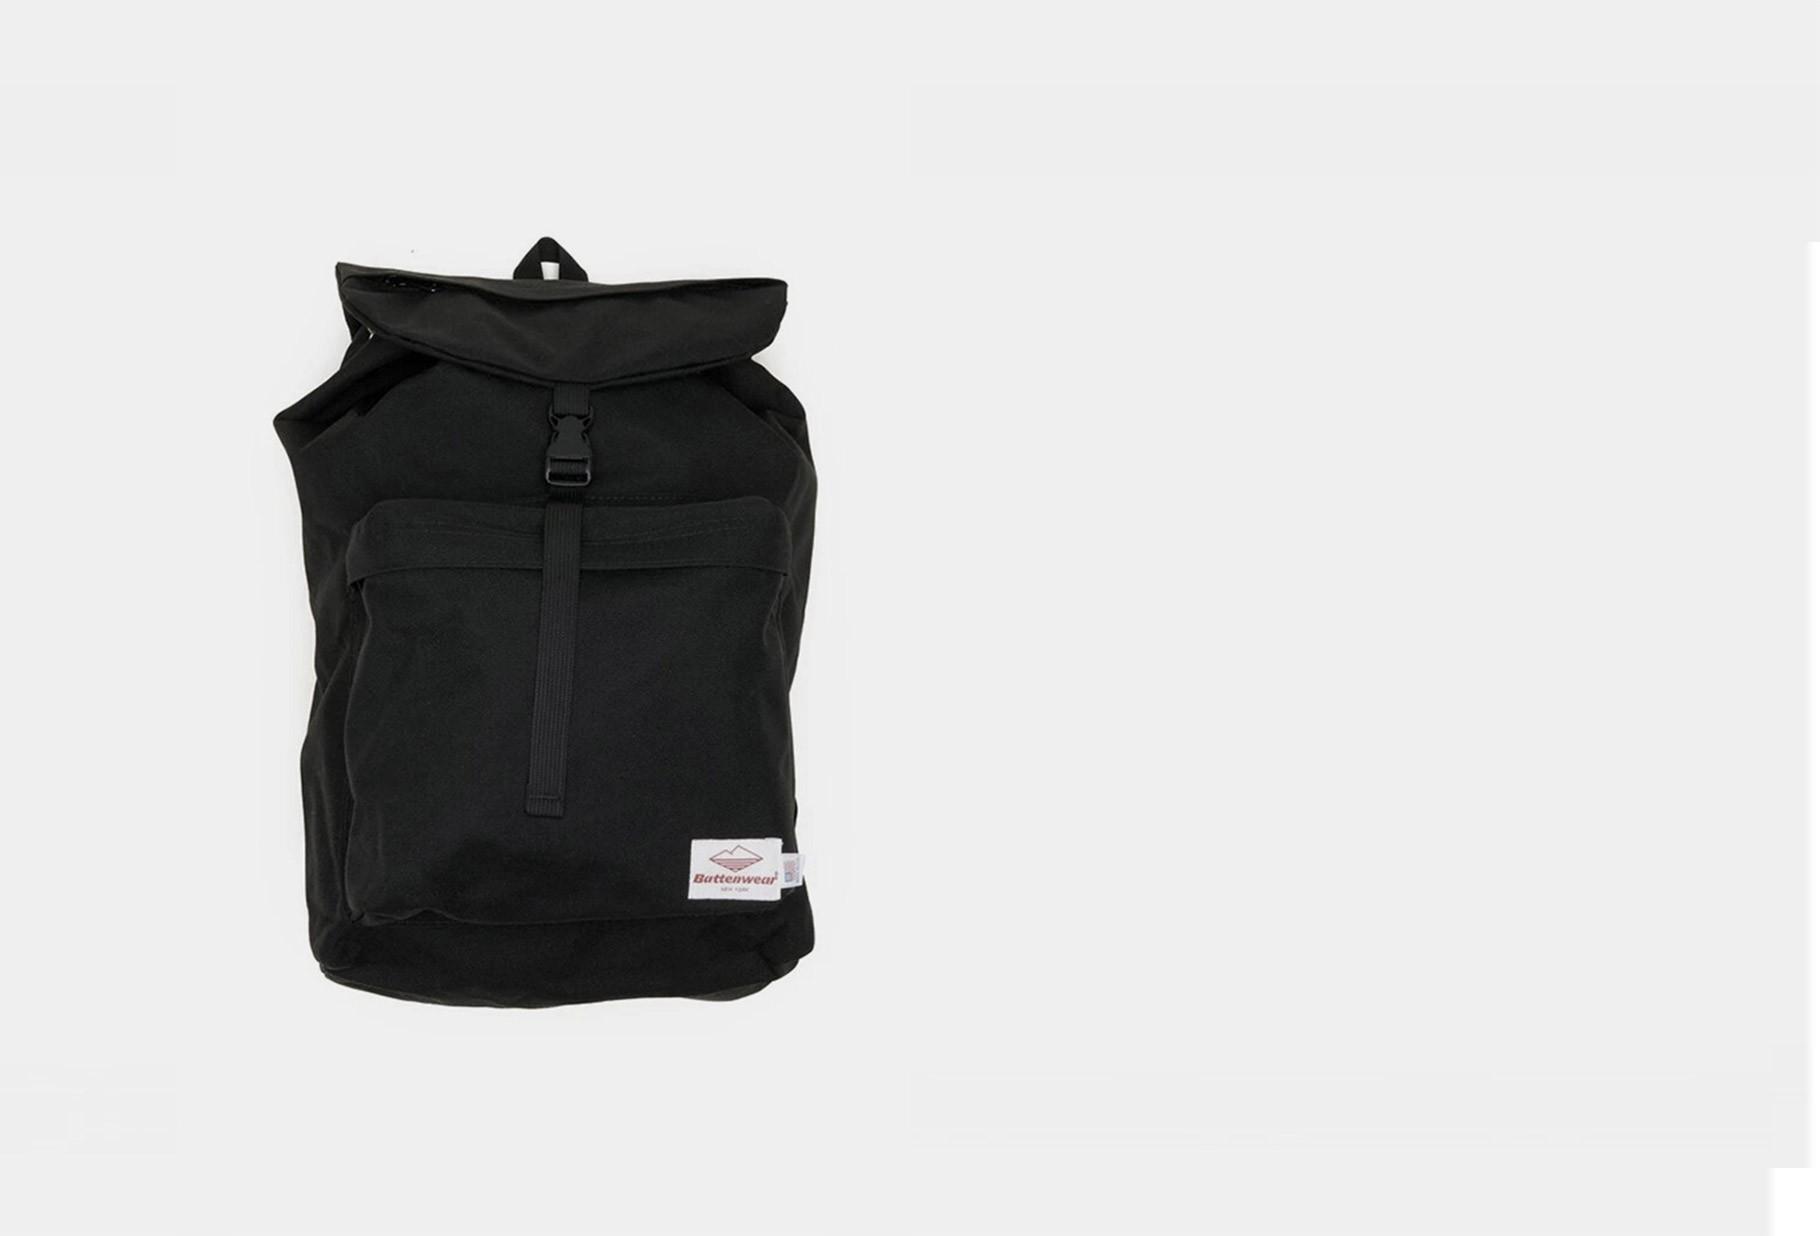 BATTENWEAR / Day hiker Black nylon